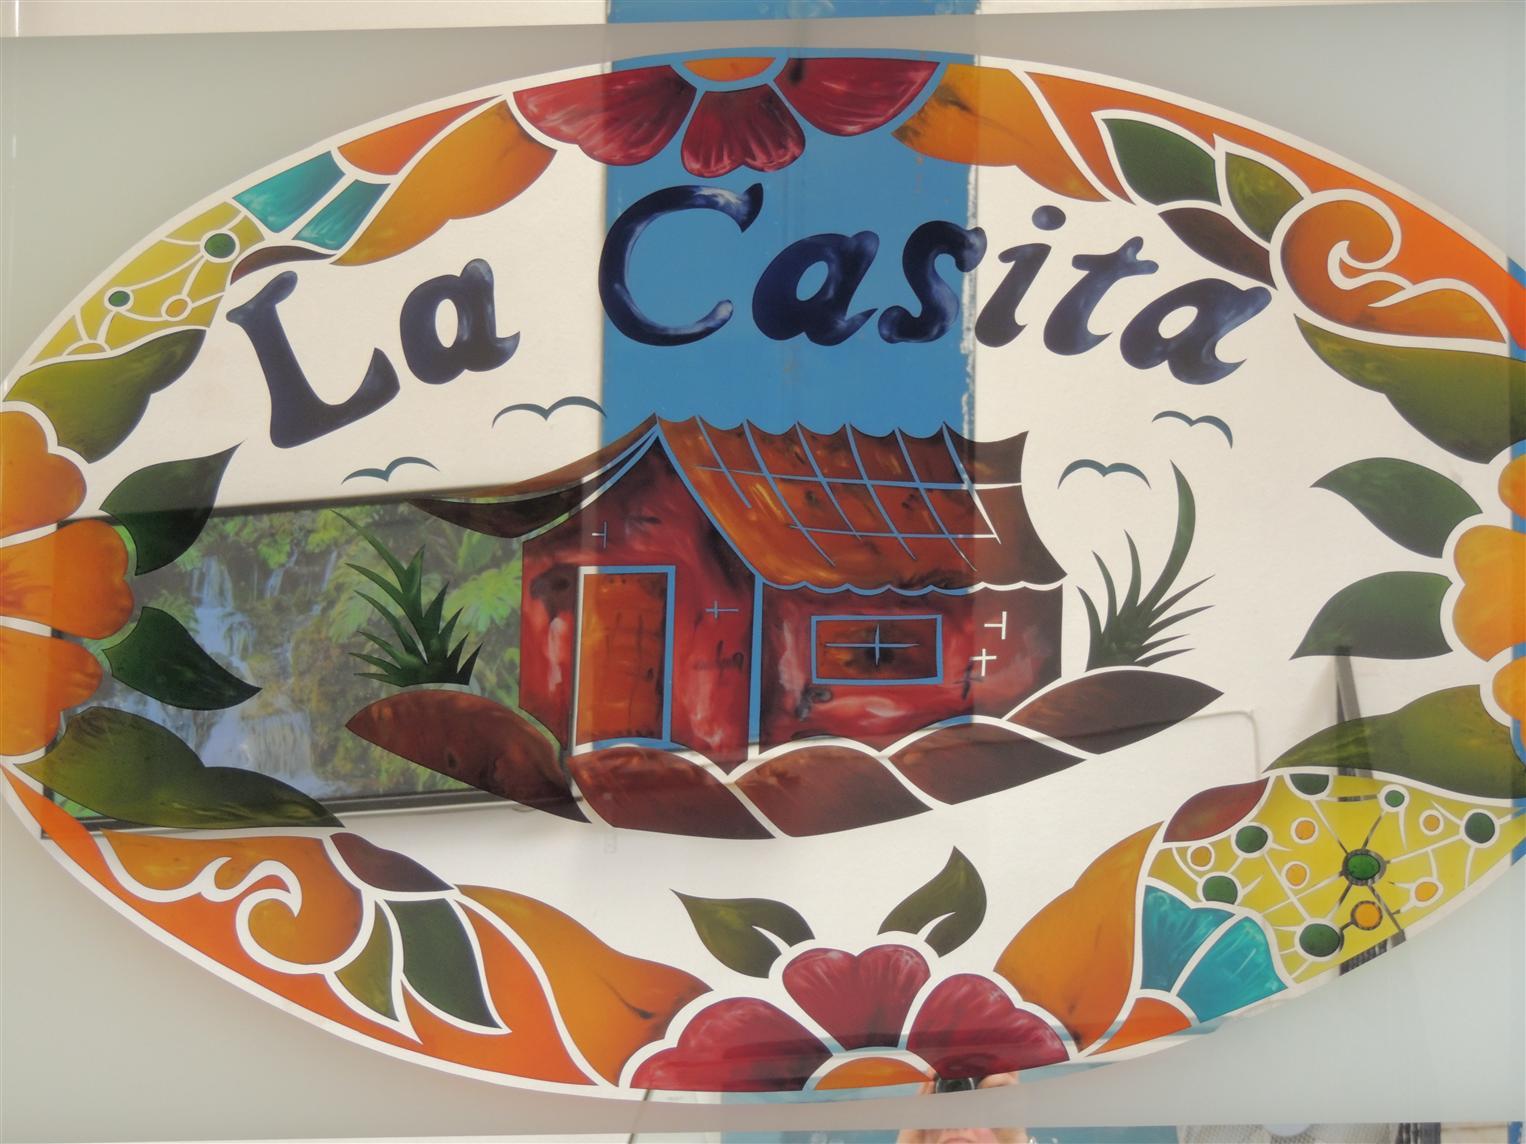 la-casita-cafe201592285013723.jpg izmir vitray çalışması